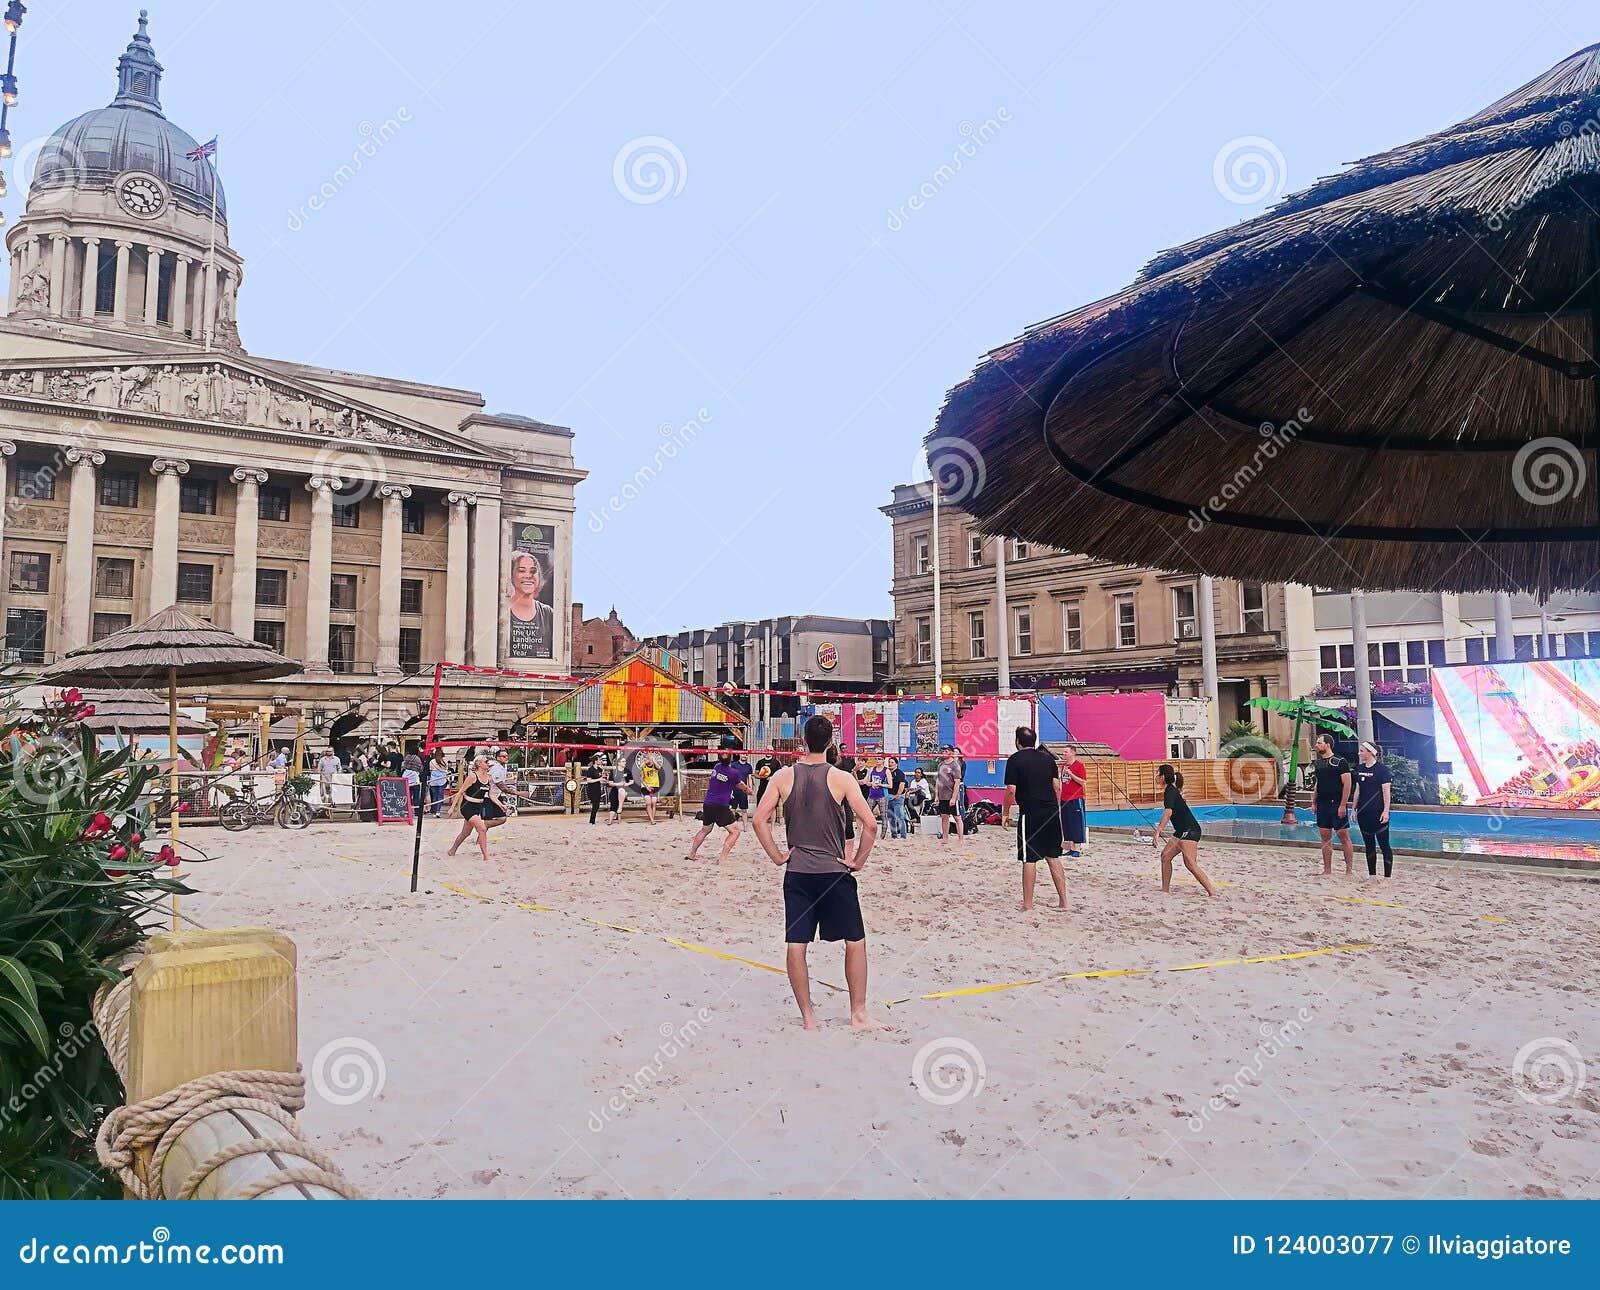 Engeland, strandvolleyball dichtbij het stadhuis van Nottingham